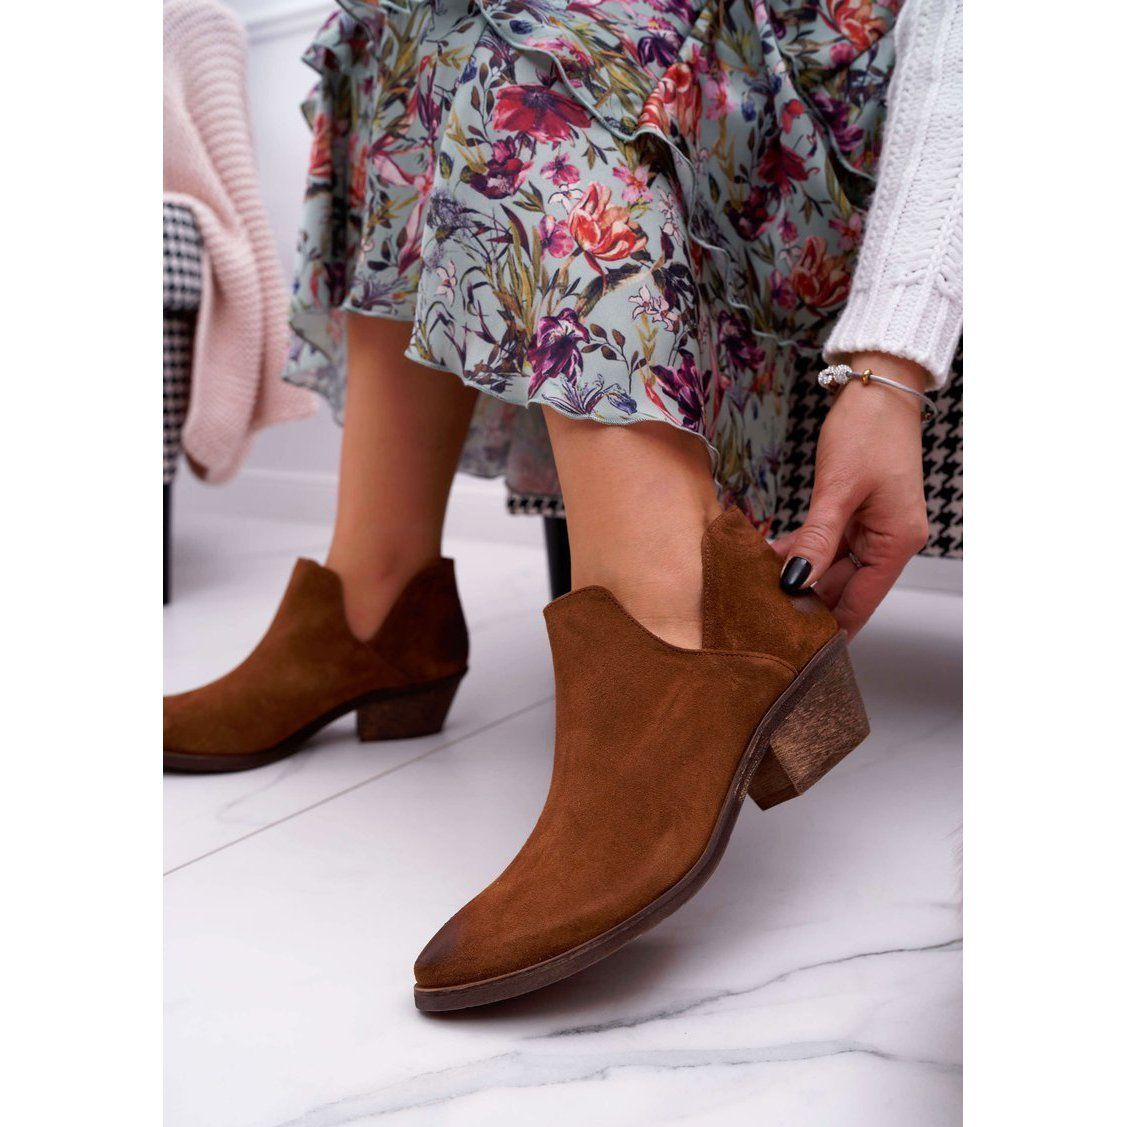 Nicole Botki Damskie Brazowe Wiosenne Skorzane Anabella Boots Ankle Boot Shoes